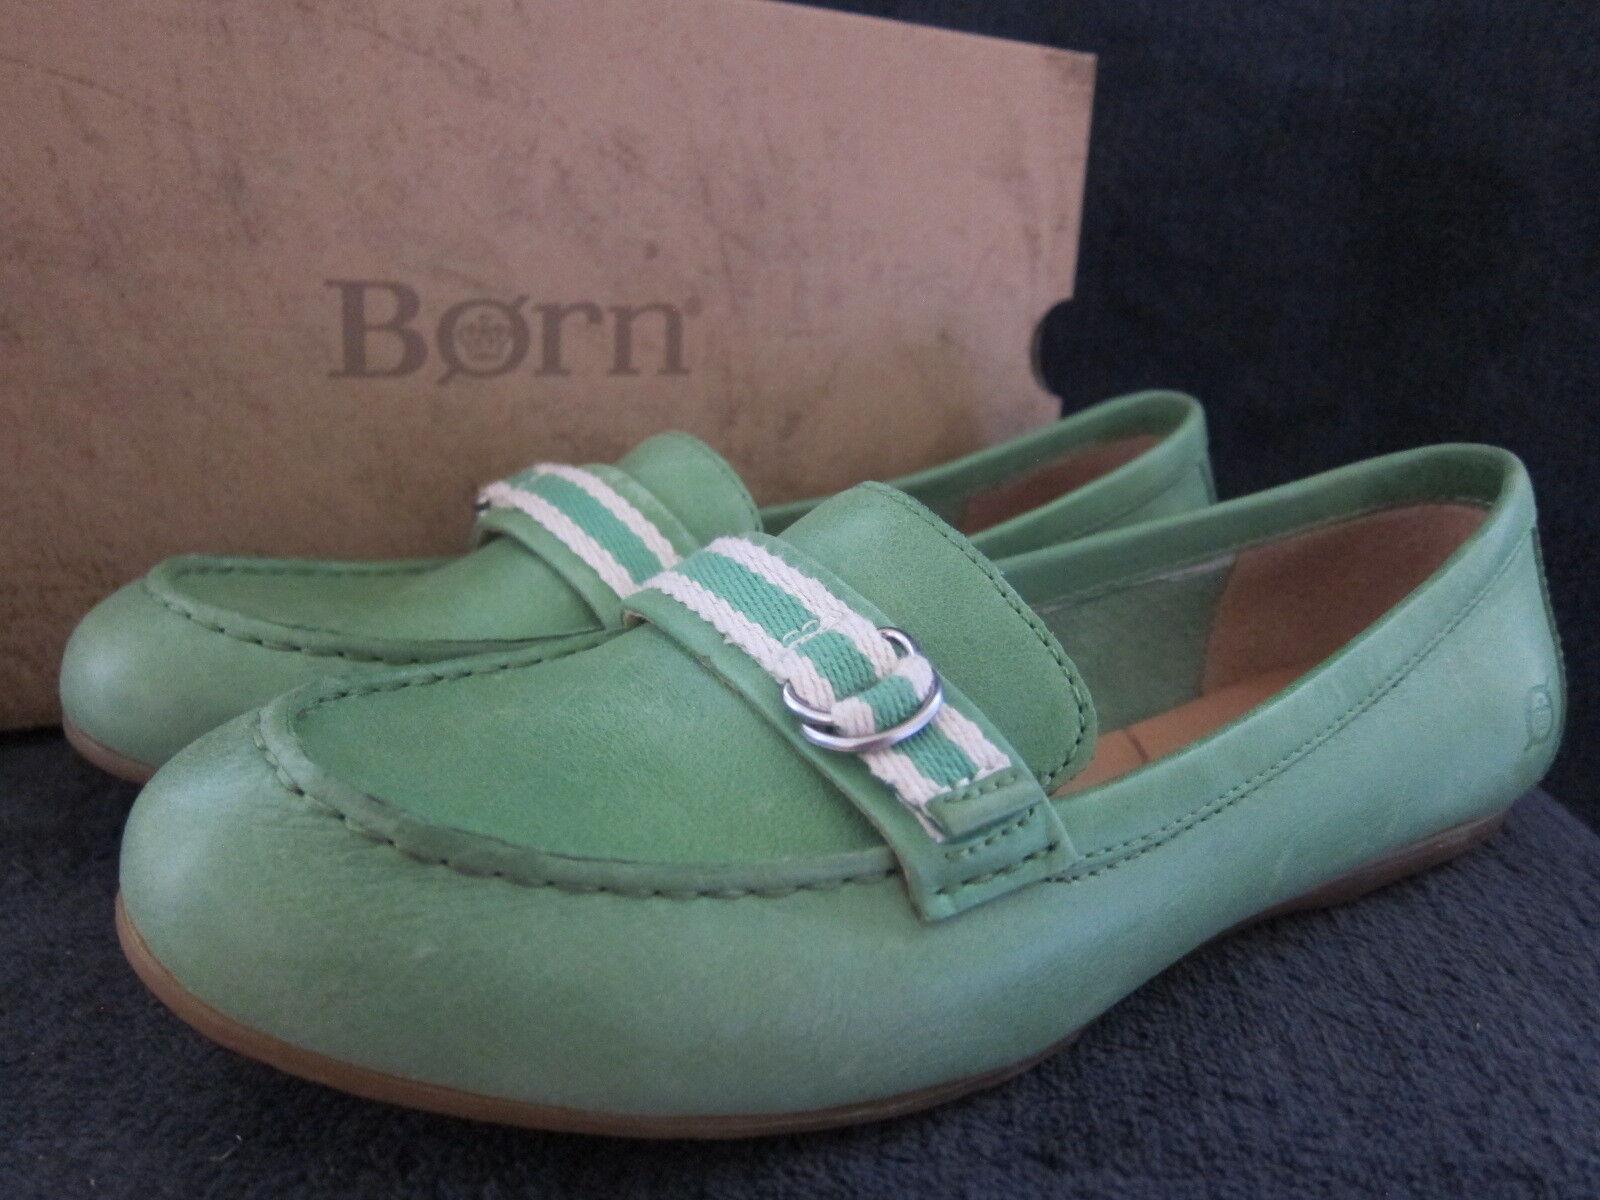 BORN Womens Maxine B77629 Green Slip On Moccasins Flats shoes US 8.5 M EU 40 NWB